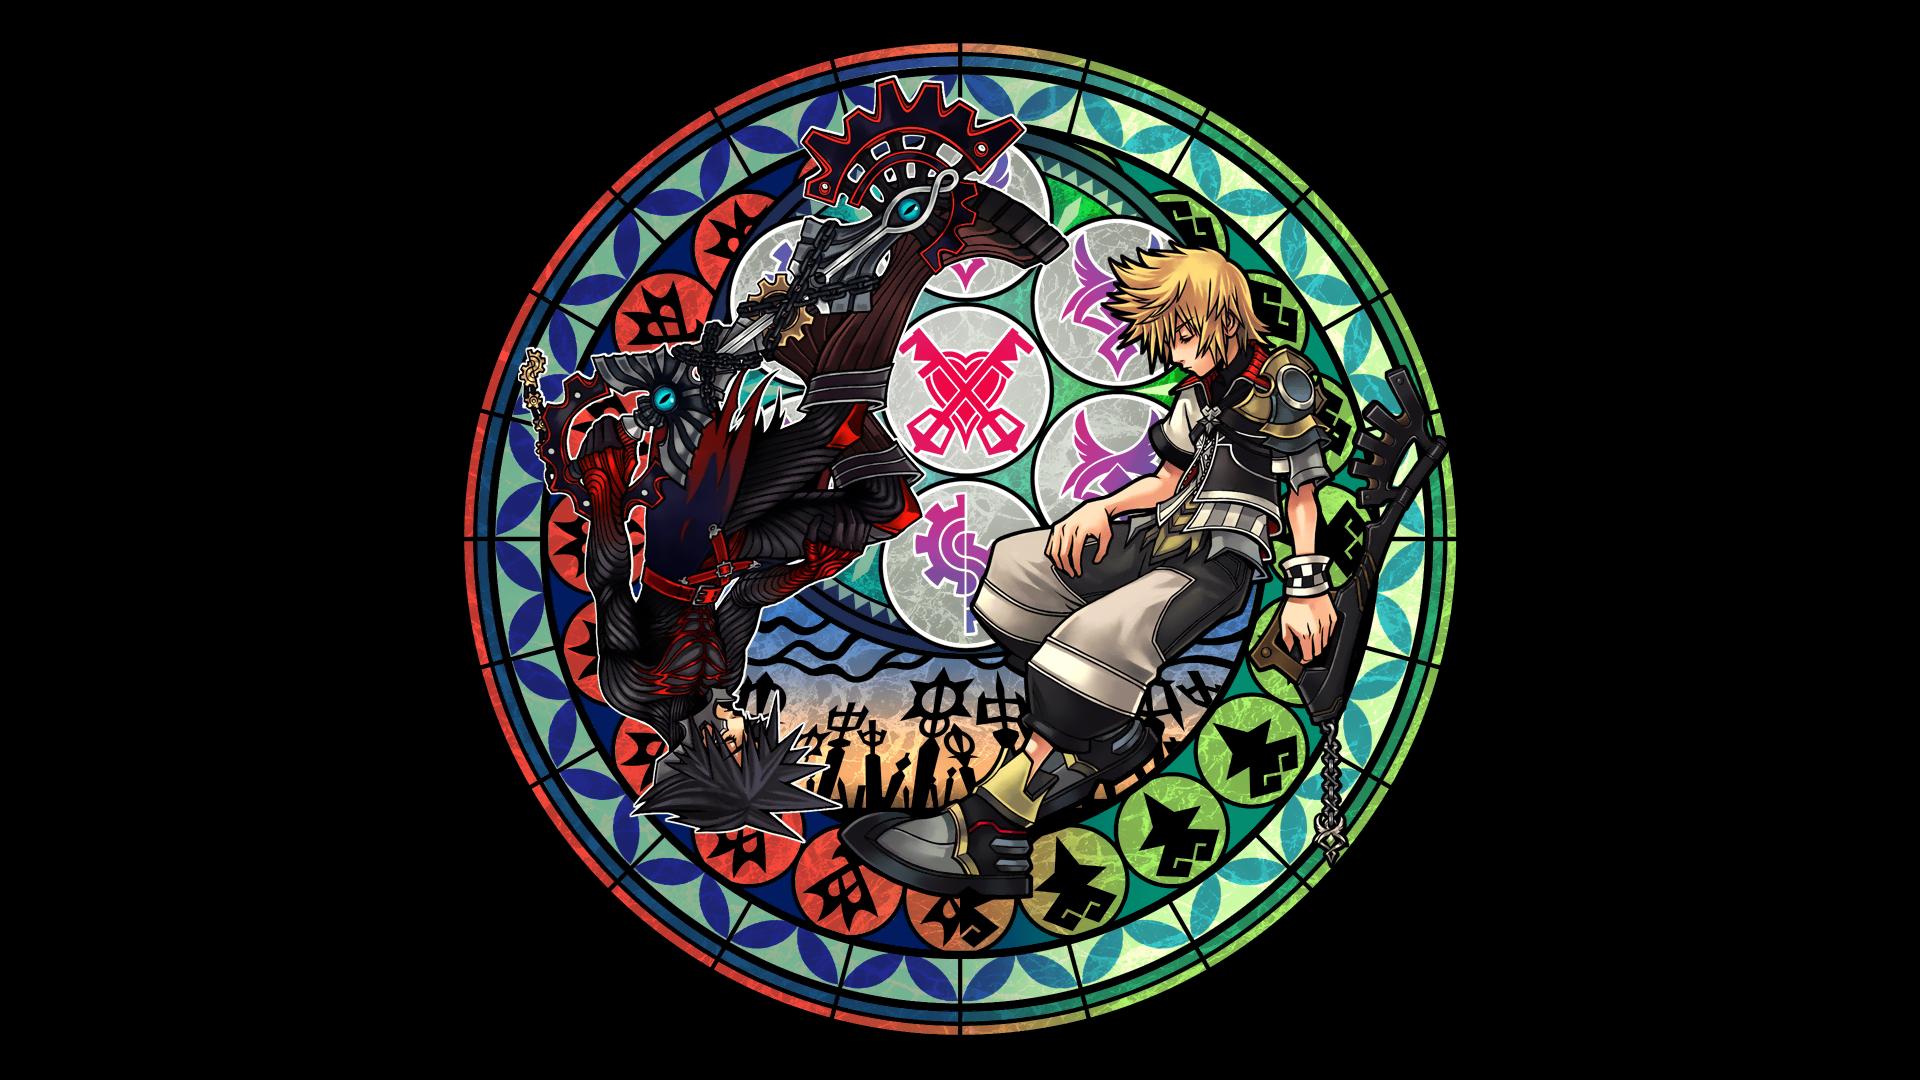 Kingdom Hearts Computer Wallpapers Desktop Backgrounds 1920x1080 1920x1080